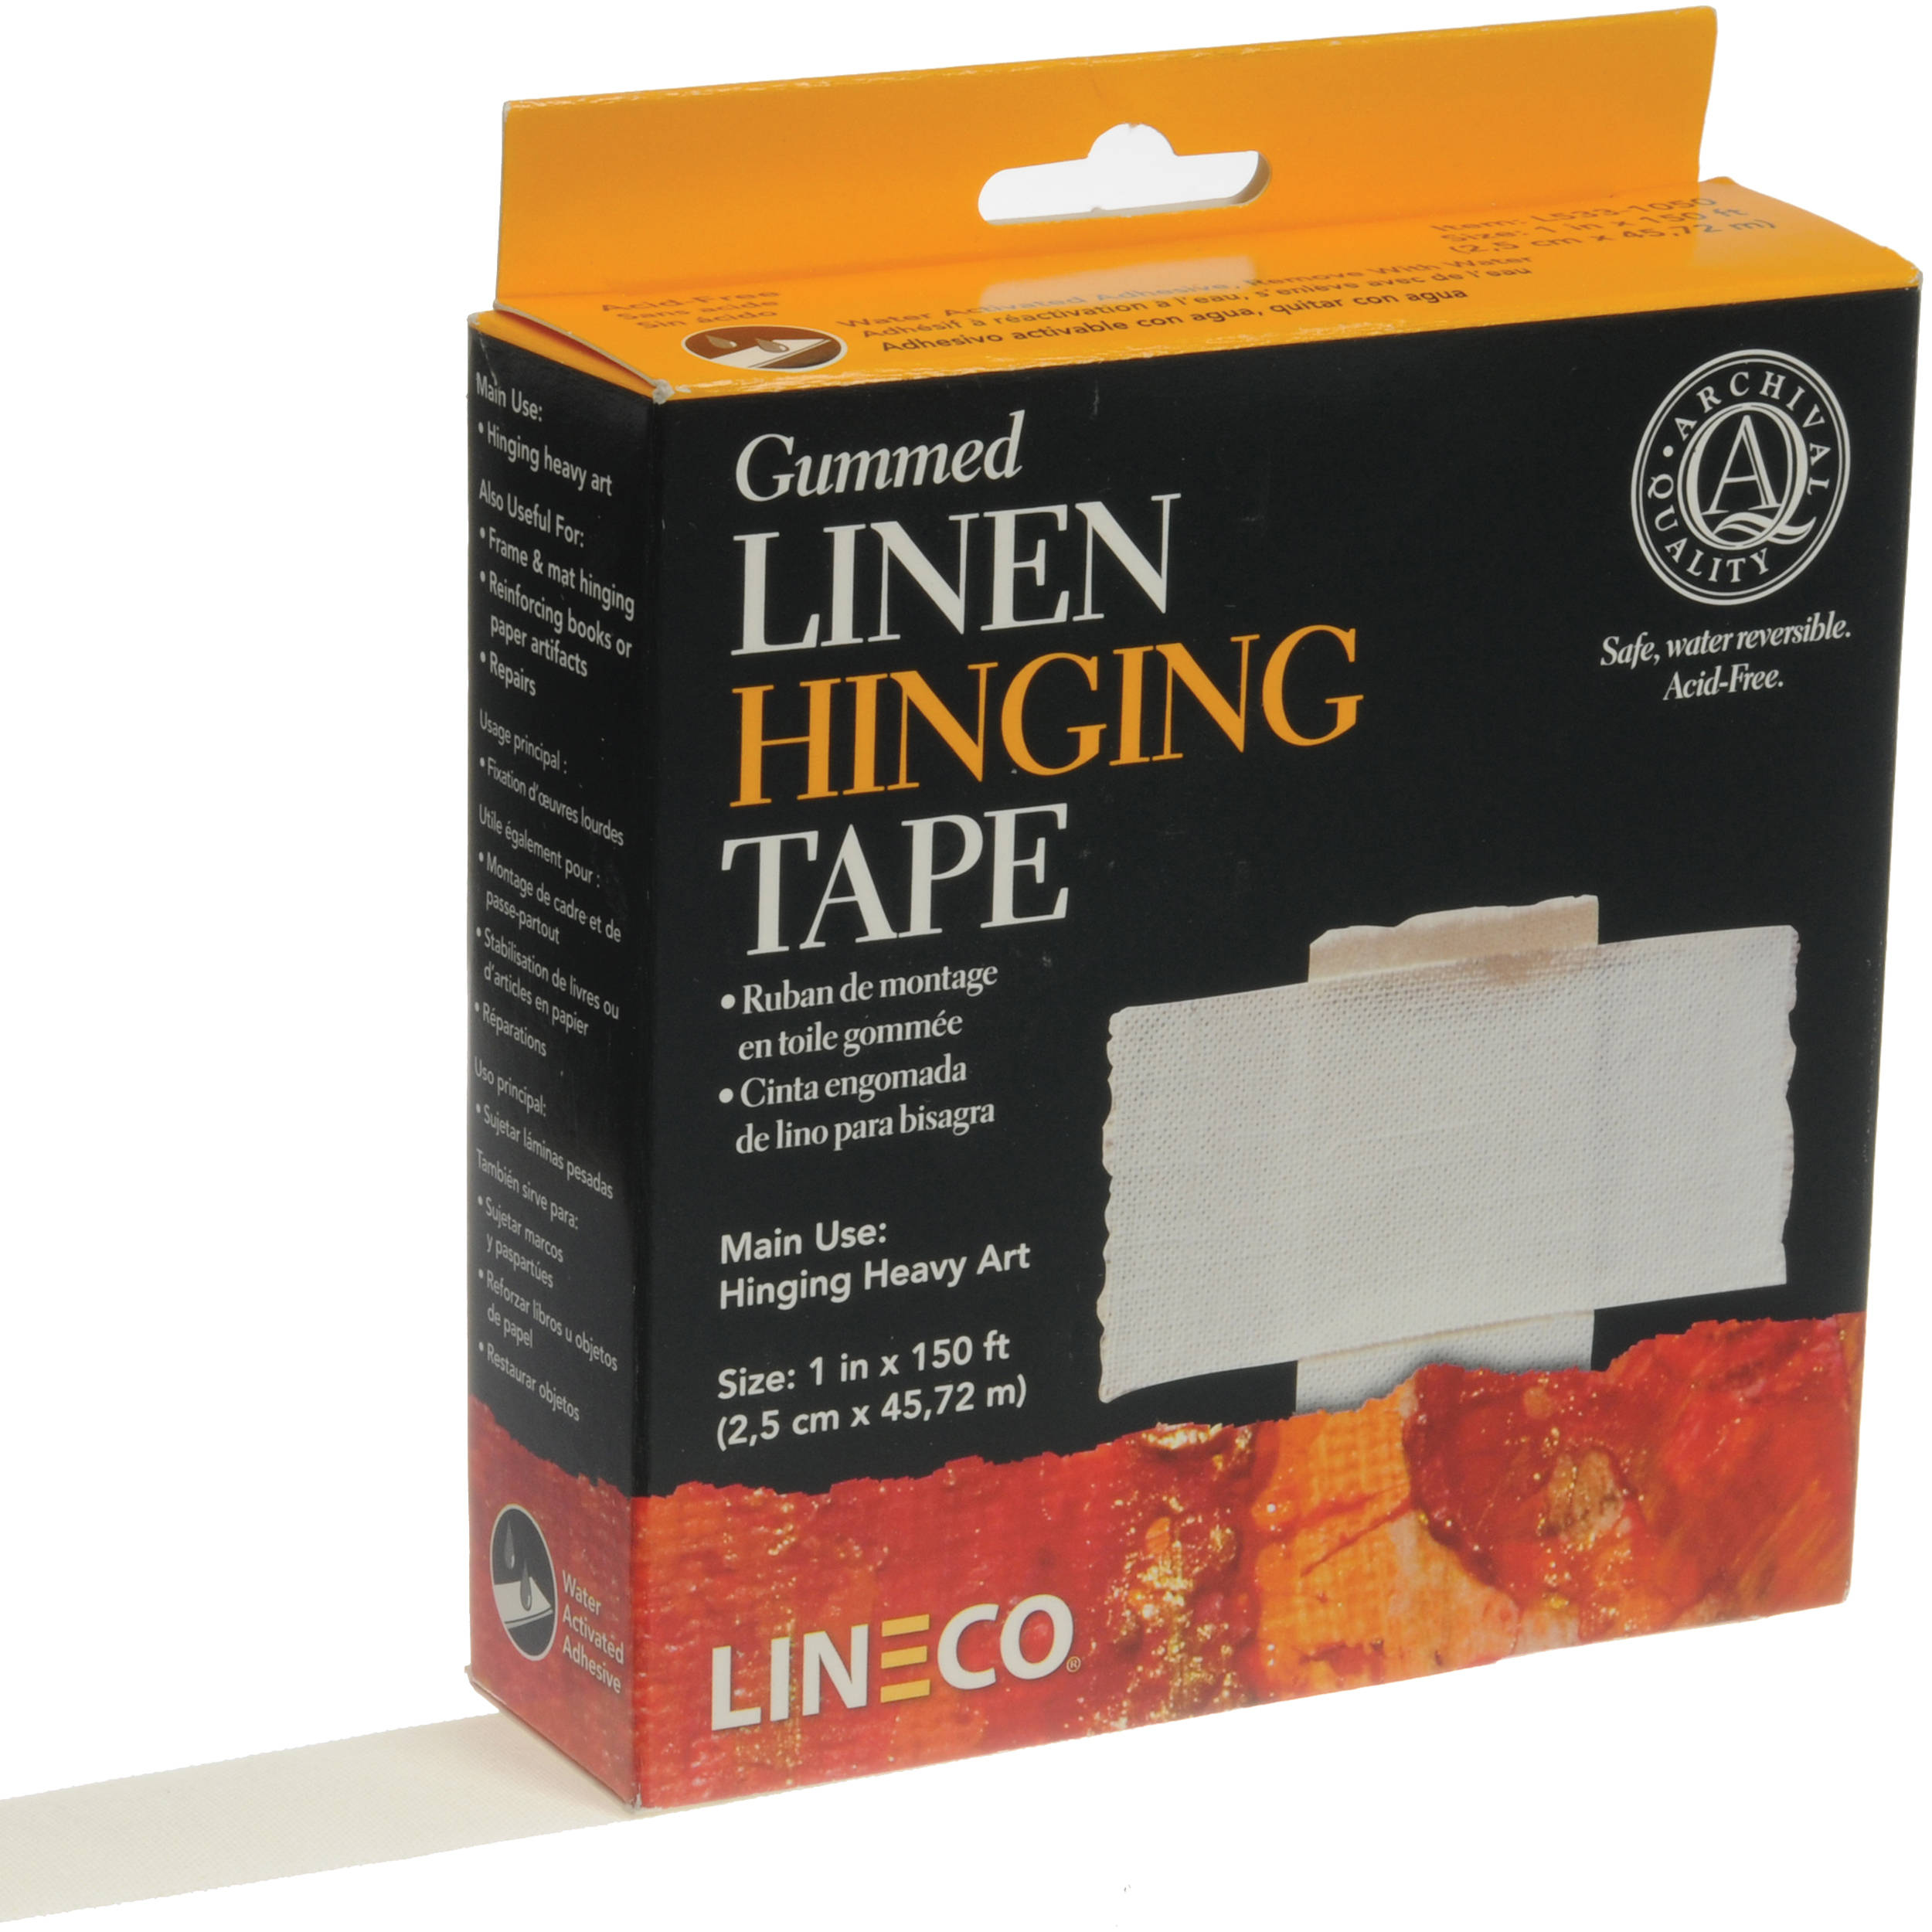 Lineco Gummed Linen Hinging Tape 1 Quot X 150 L533 1050 B Amp H